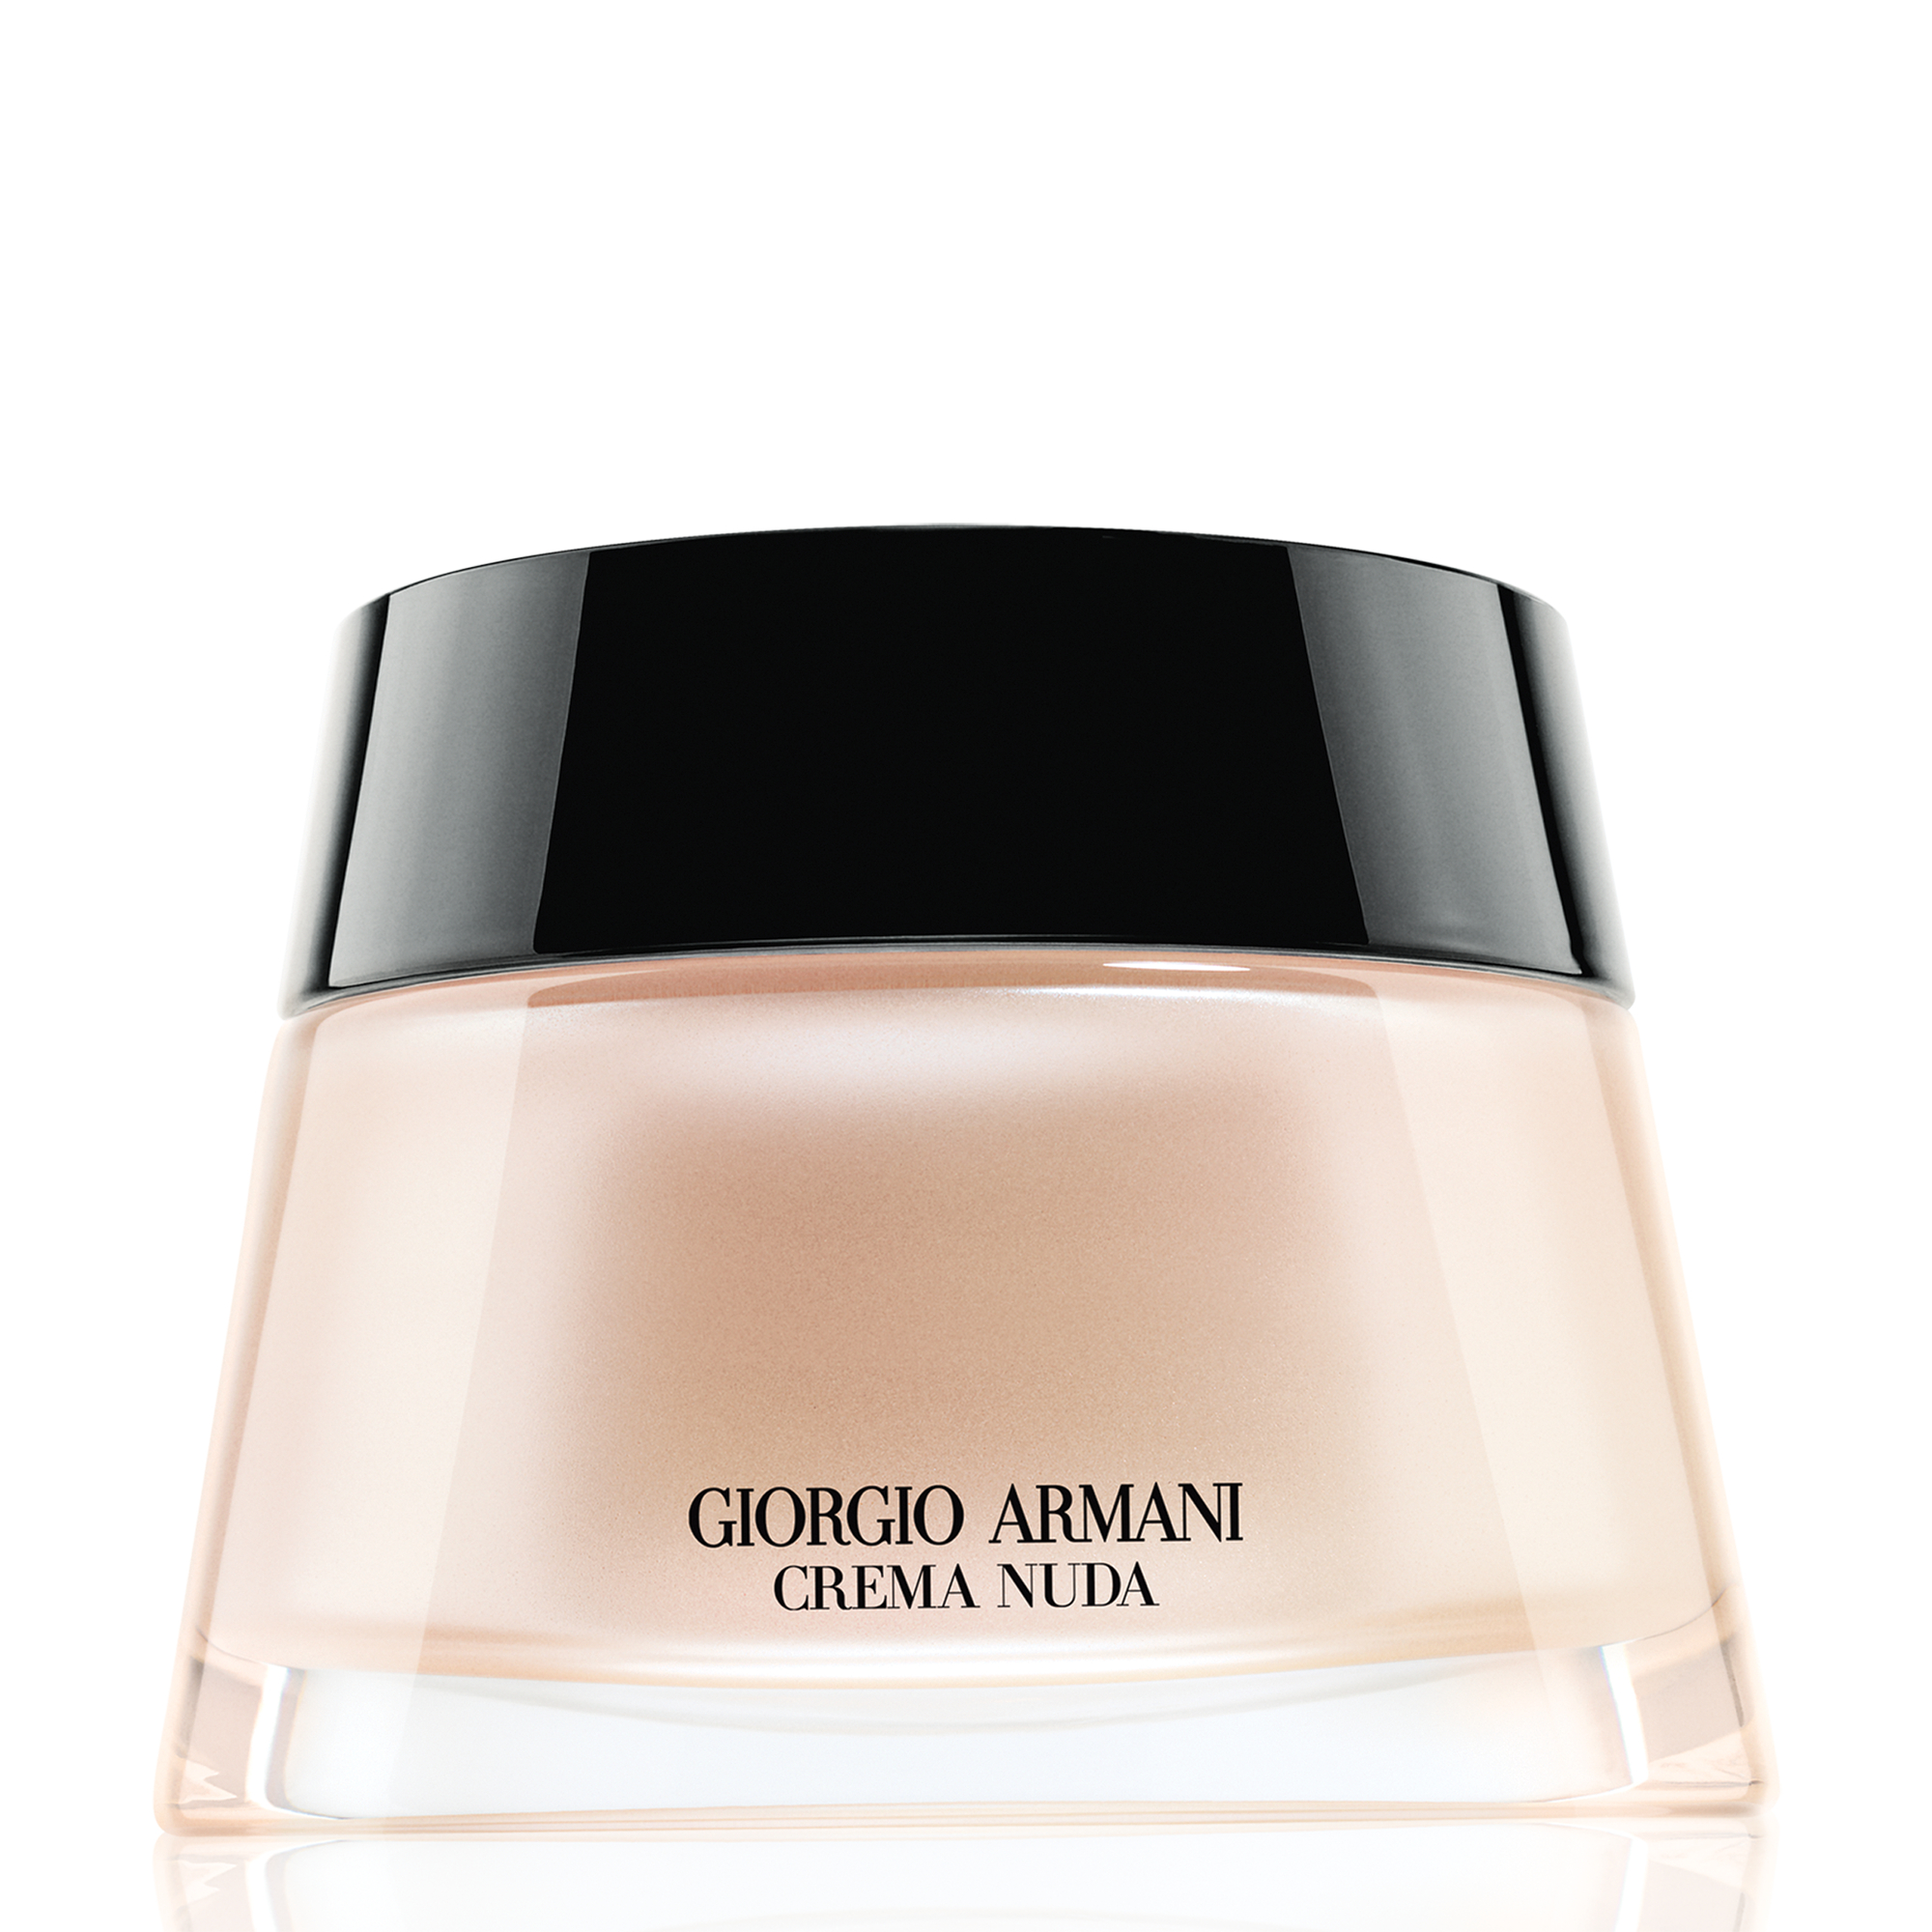 Crema Nuda Tinted Face Cream 02 Light Glow